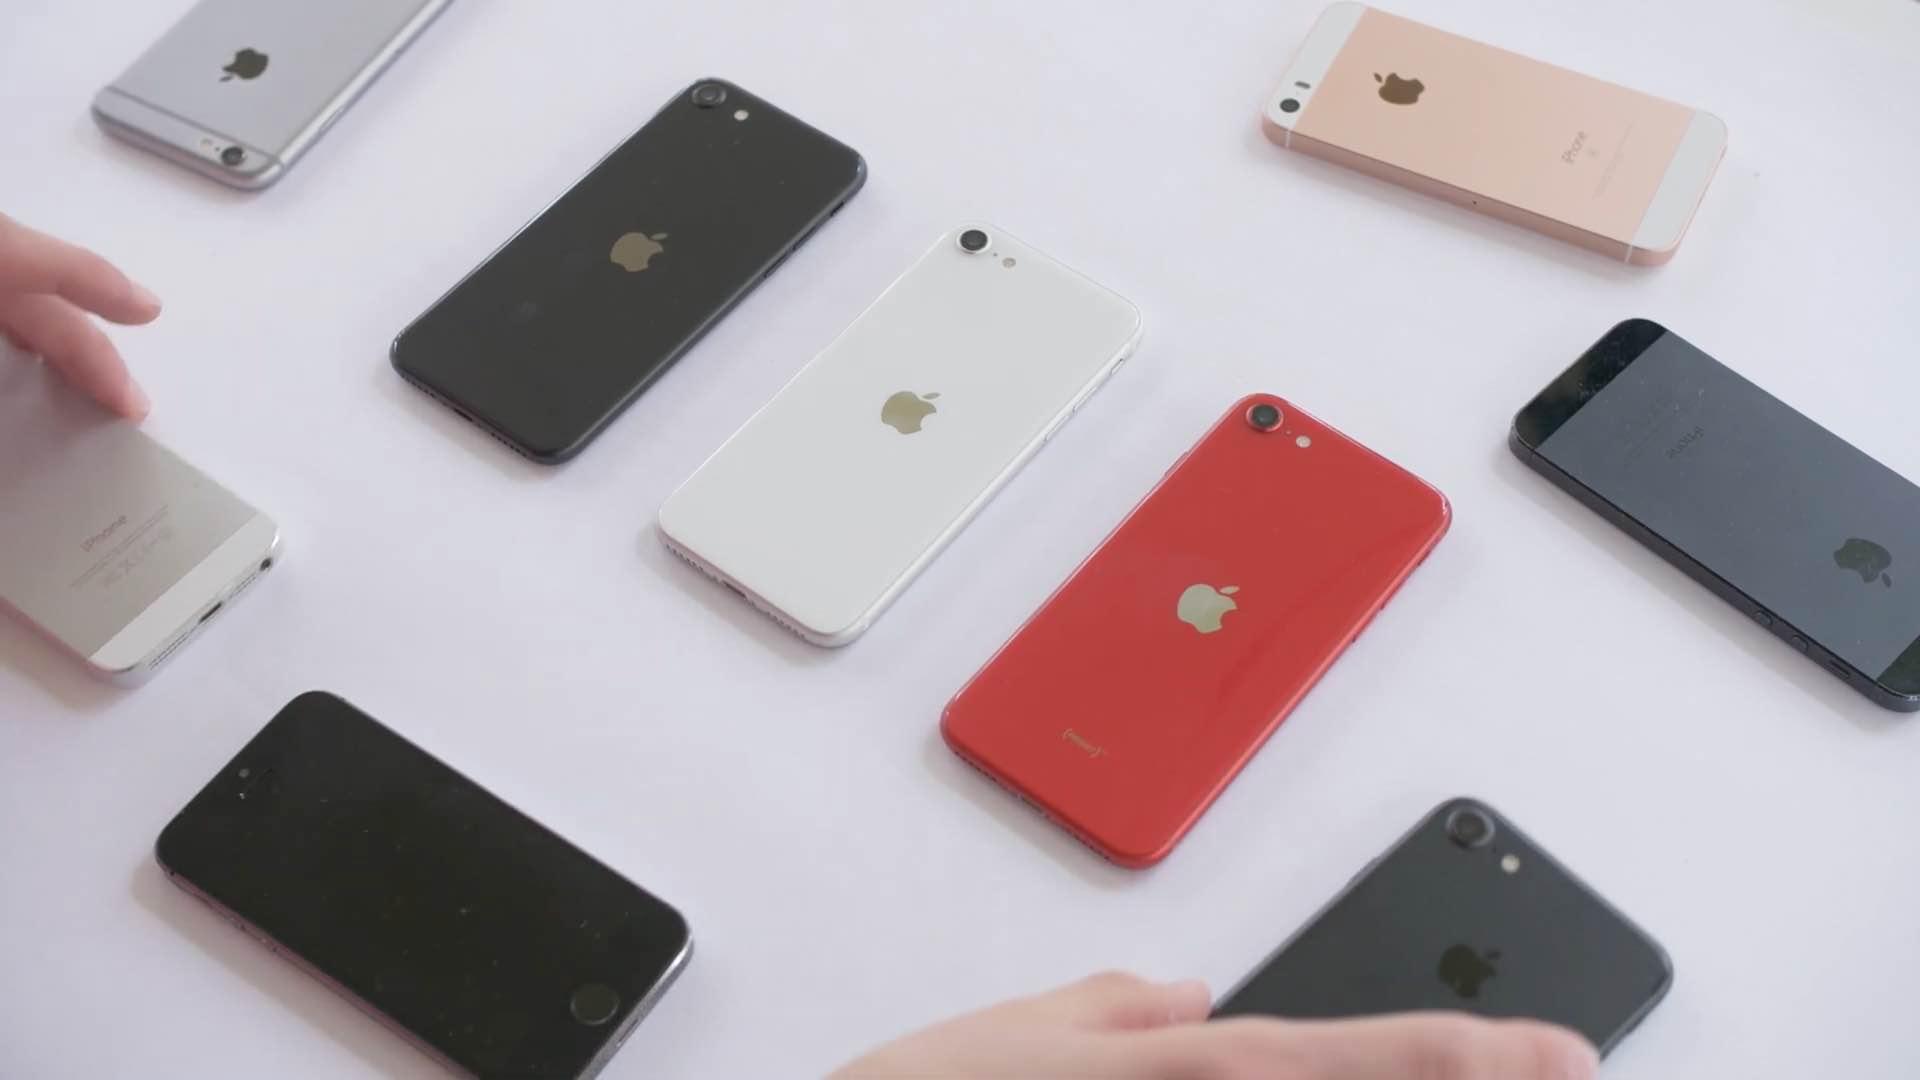 iPhone SE unboxing